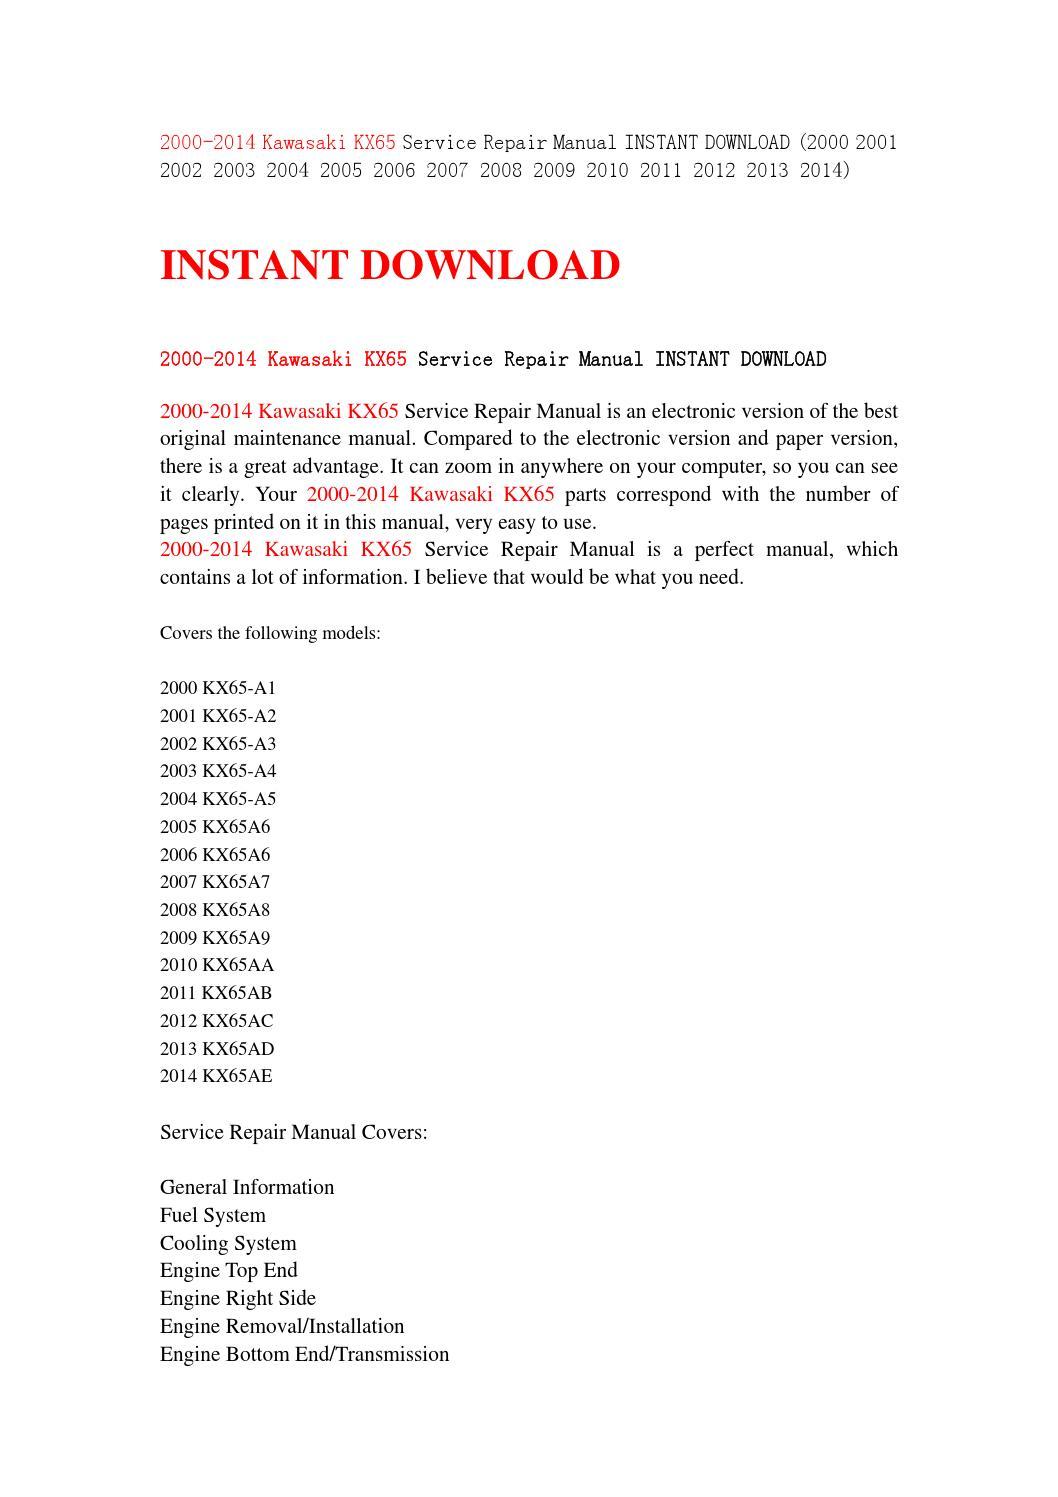 2000 2014 kawasaki kx65 service repair manual instant download (2000 2001  2002 2003 2004 2005 2006 2 by jhsej7y - issuu